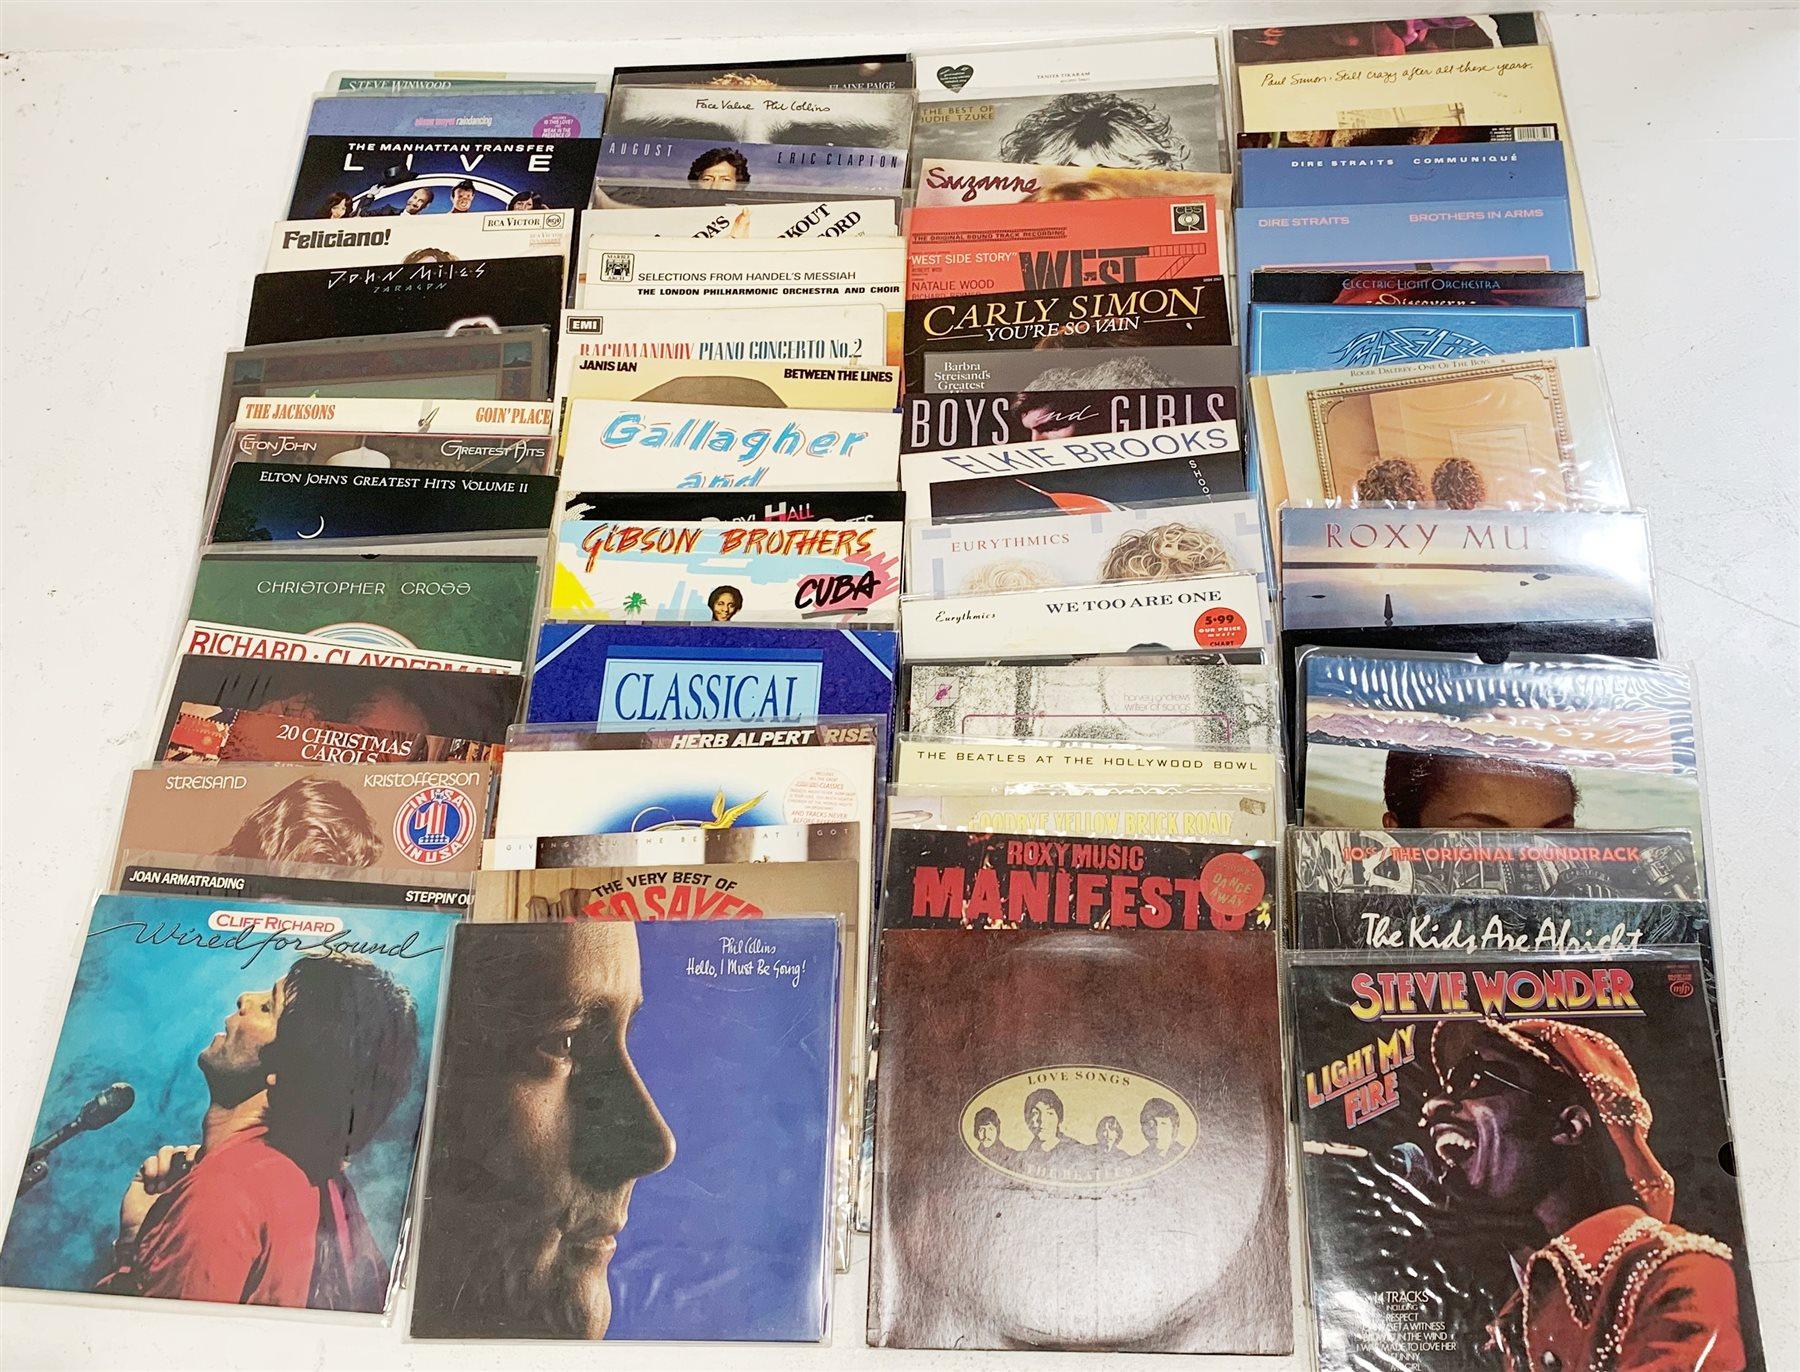 A quantity of LP's to include Elton John, Lionel Richie, Jimi Hendrix, The Beatles, Paul Simon, The